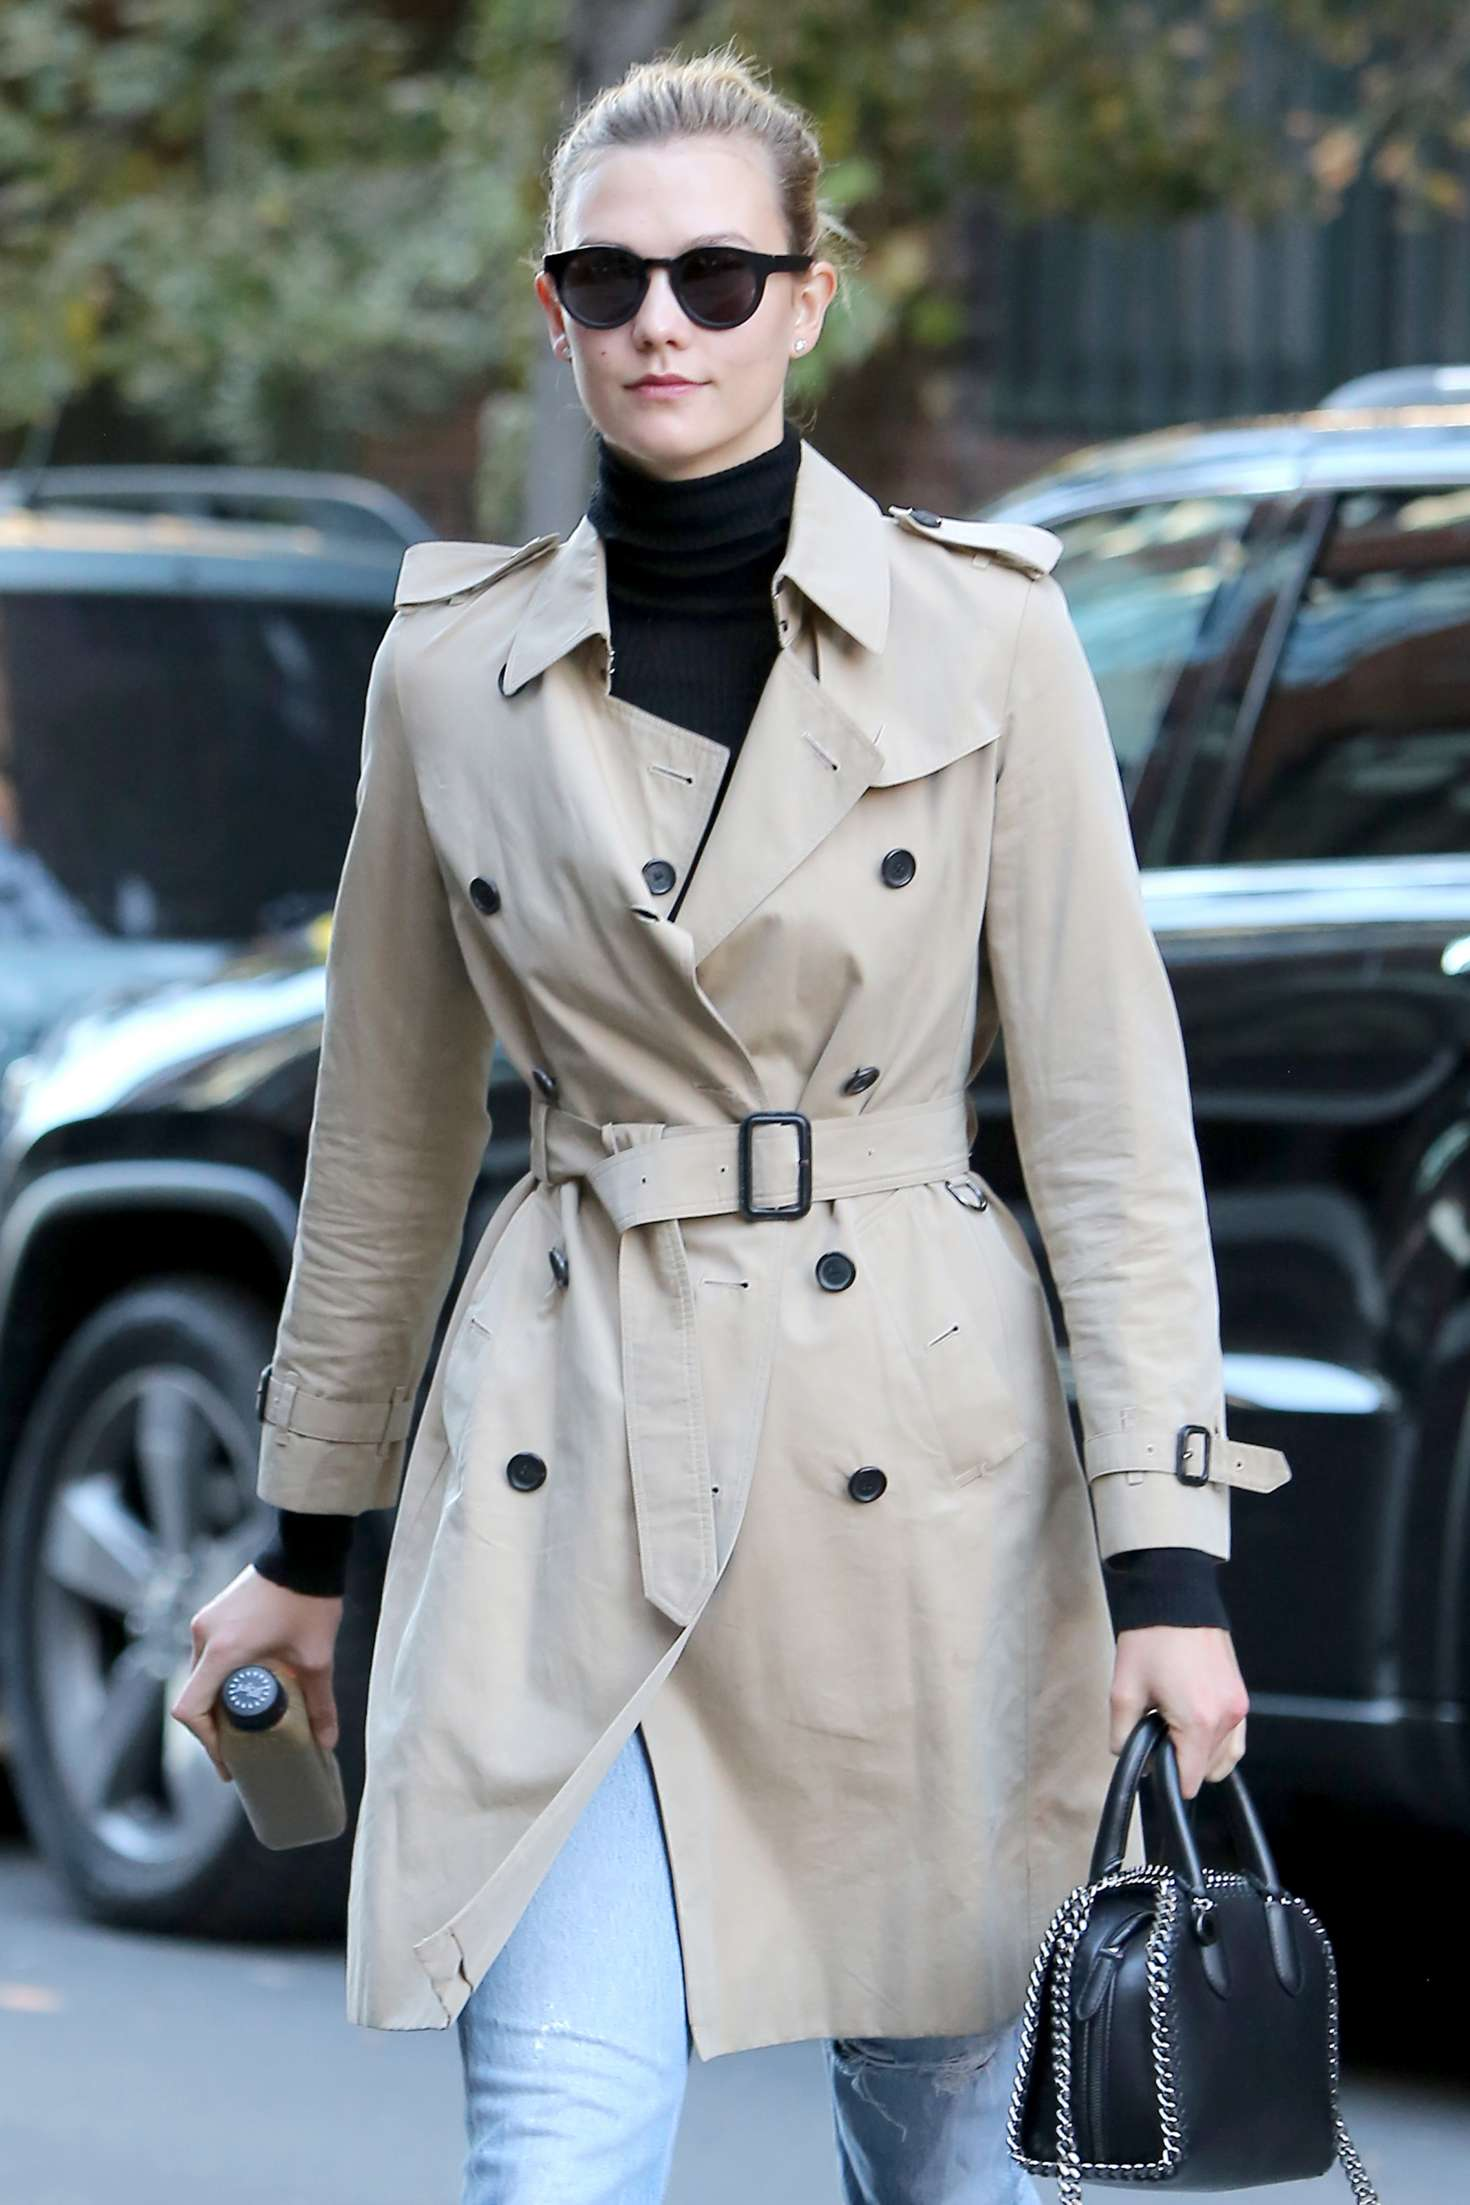 Karlie Kloss 2016 : Karlie Kloss in Jeans and Coat -05